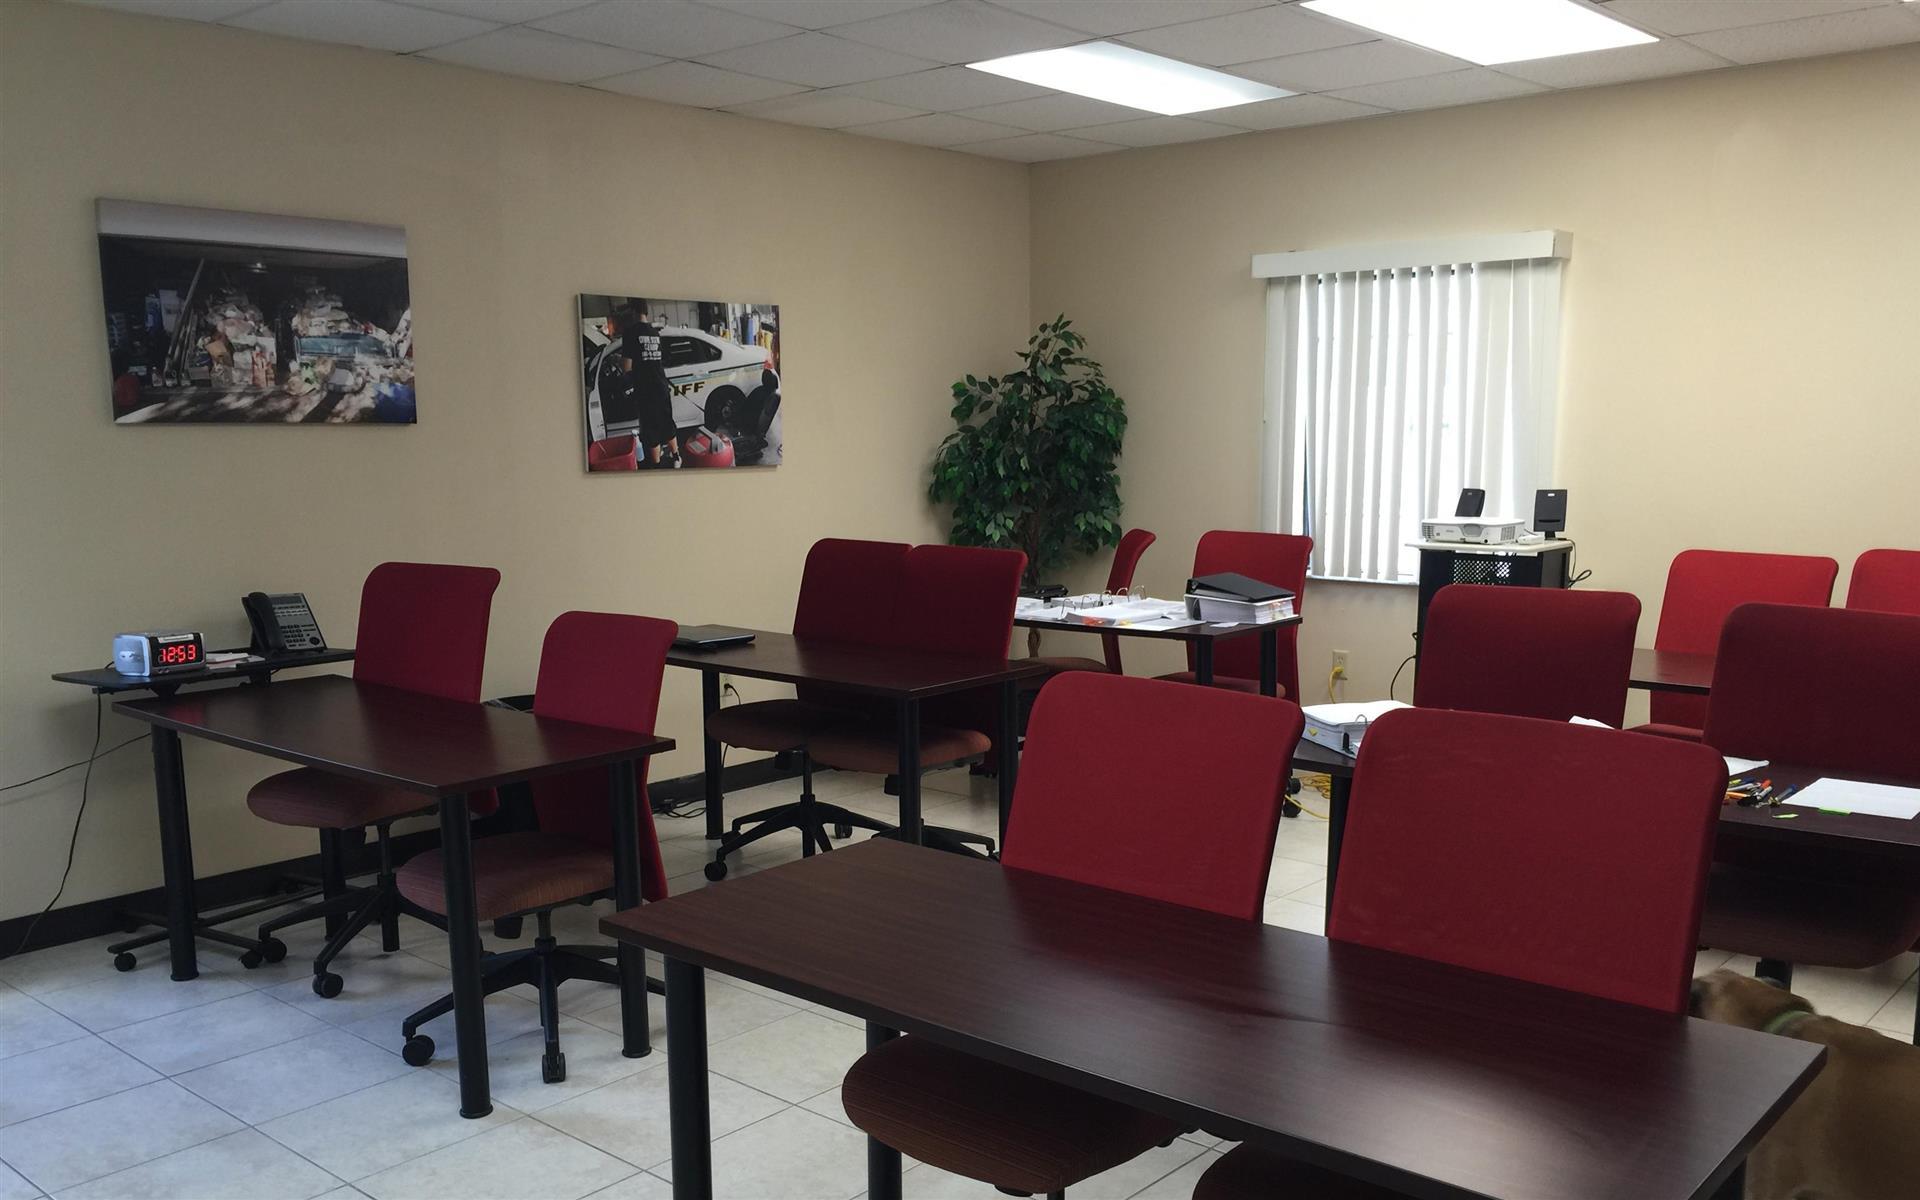 Spaulding Decon - Monthly & Hourly Space - Meeting Room 1